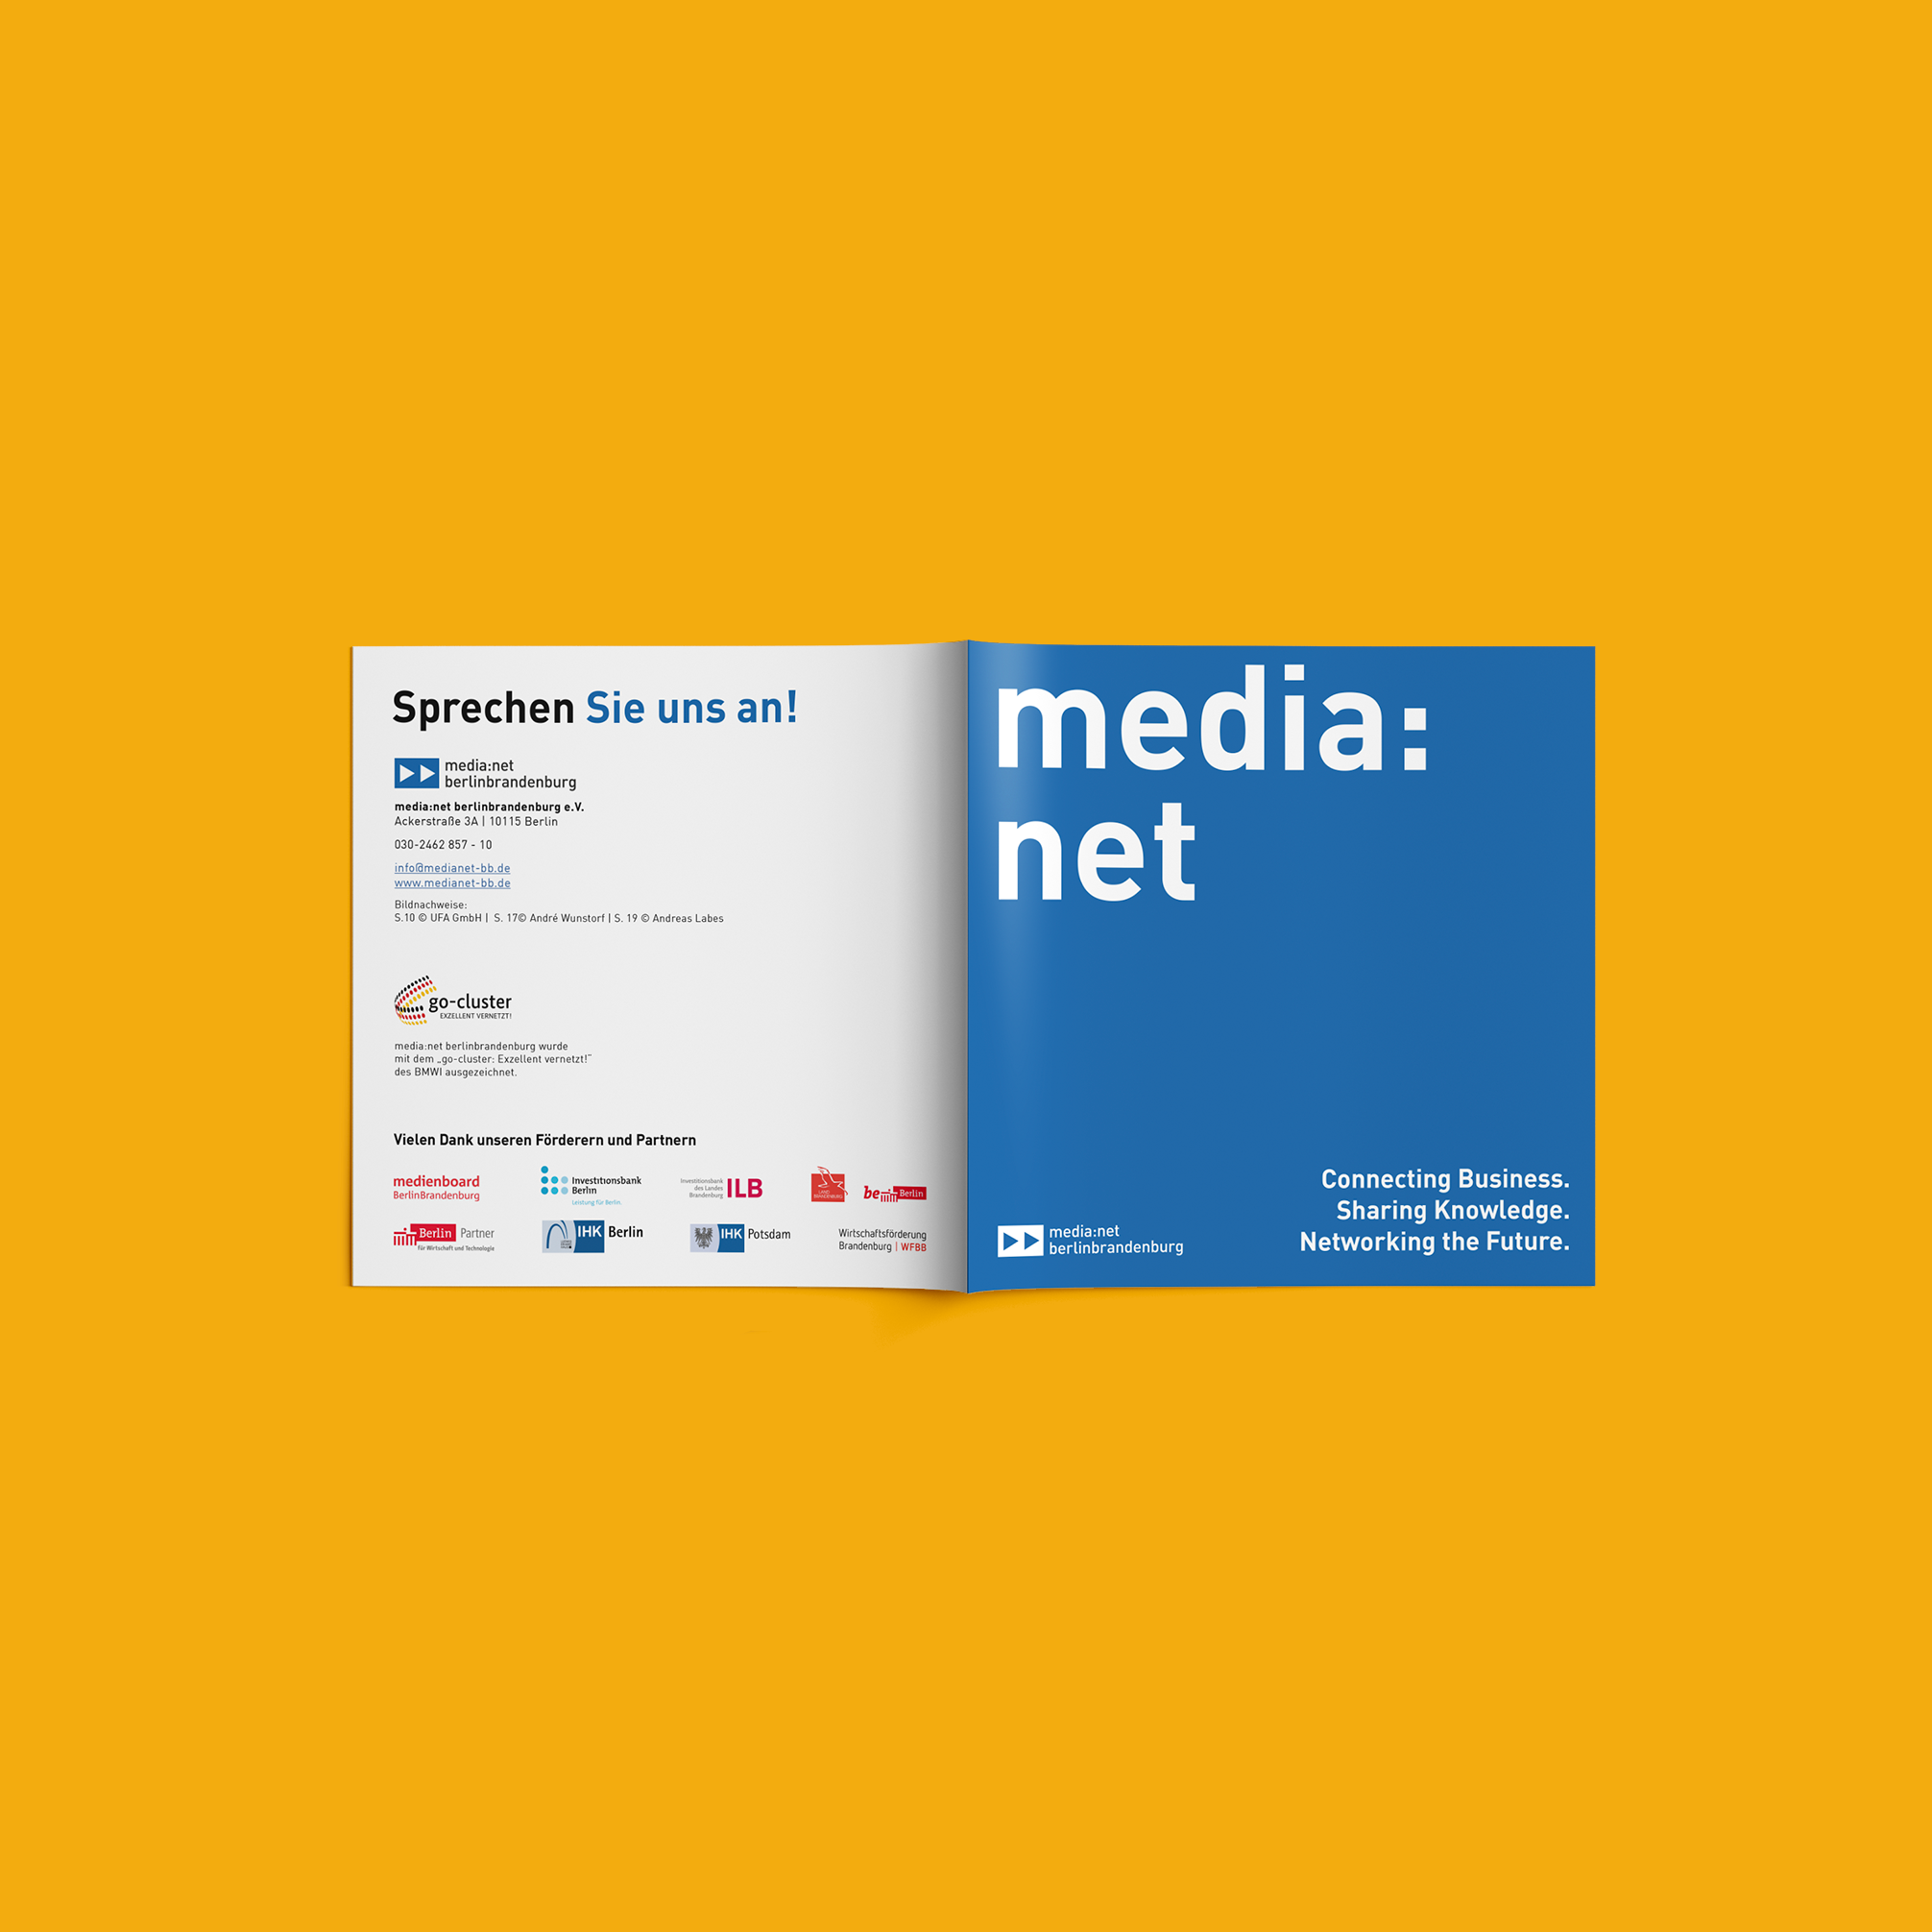 Media net berlinbrandenburg Image Booklet   Redesign Corporate Design - Cover